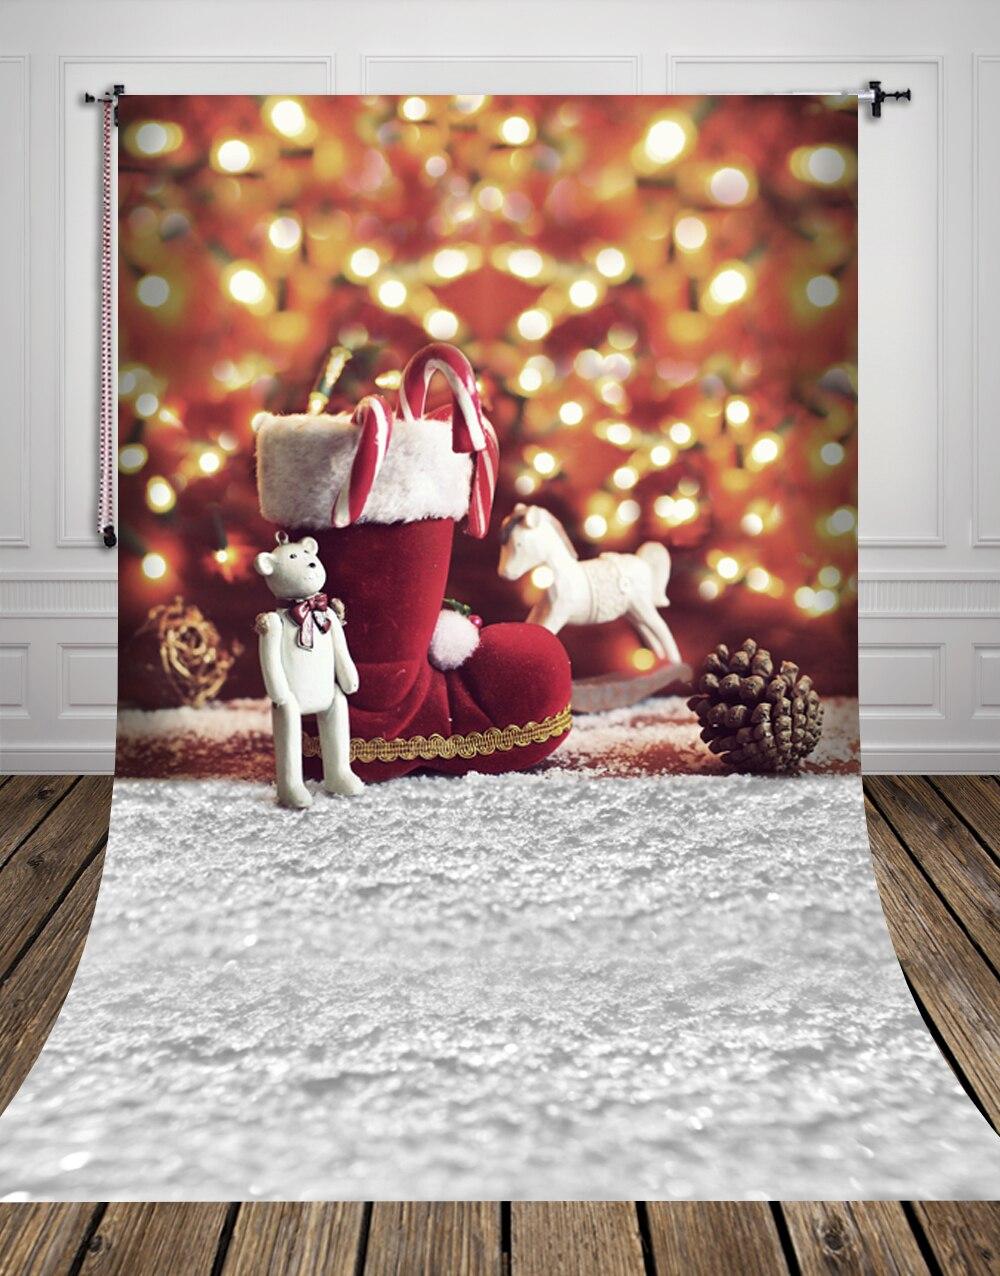 HUAYI Photography Backdrop christmas backdrops Photo Prop Christmas decoration Art Fabric backgrounds D8249